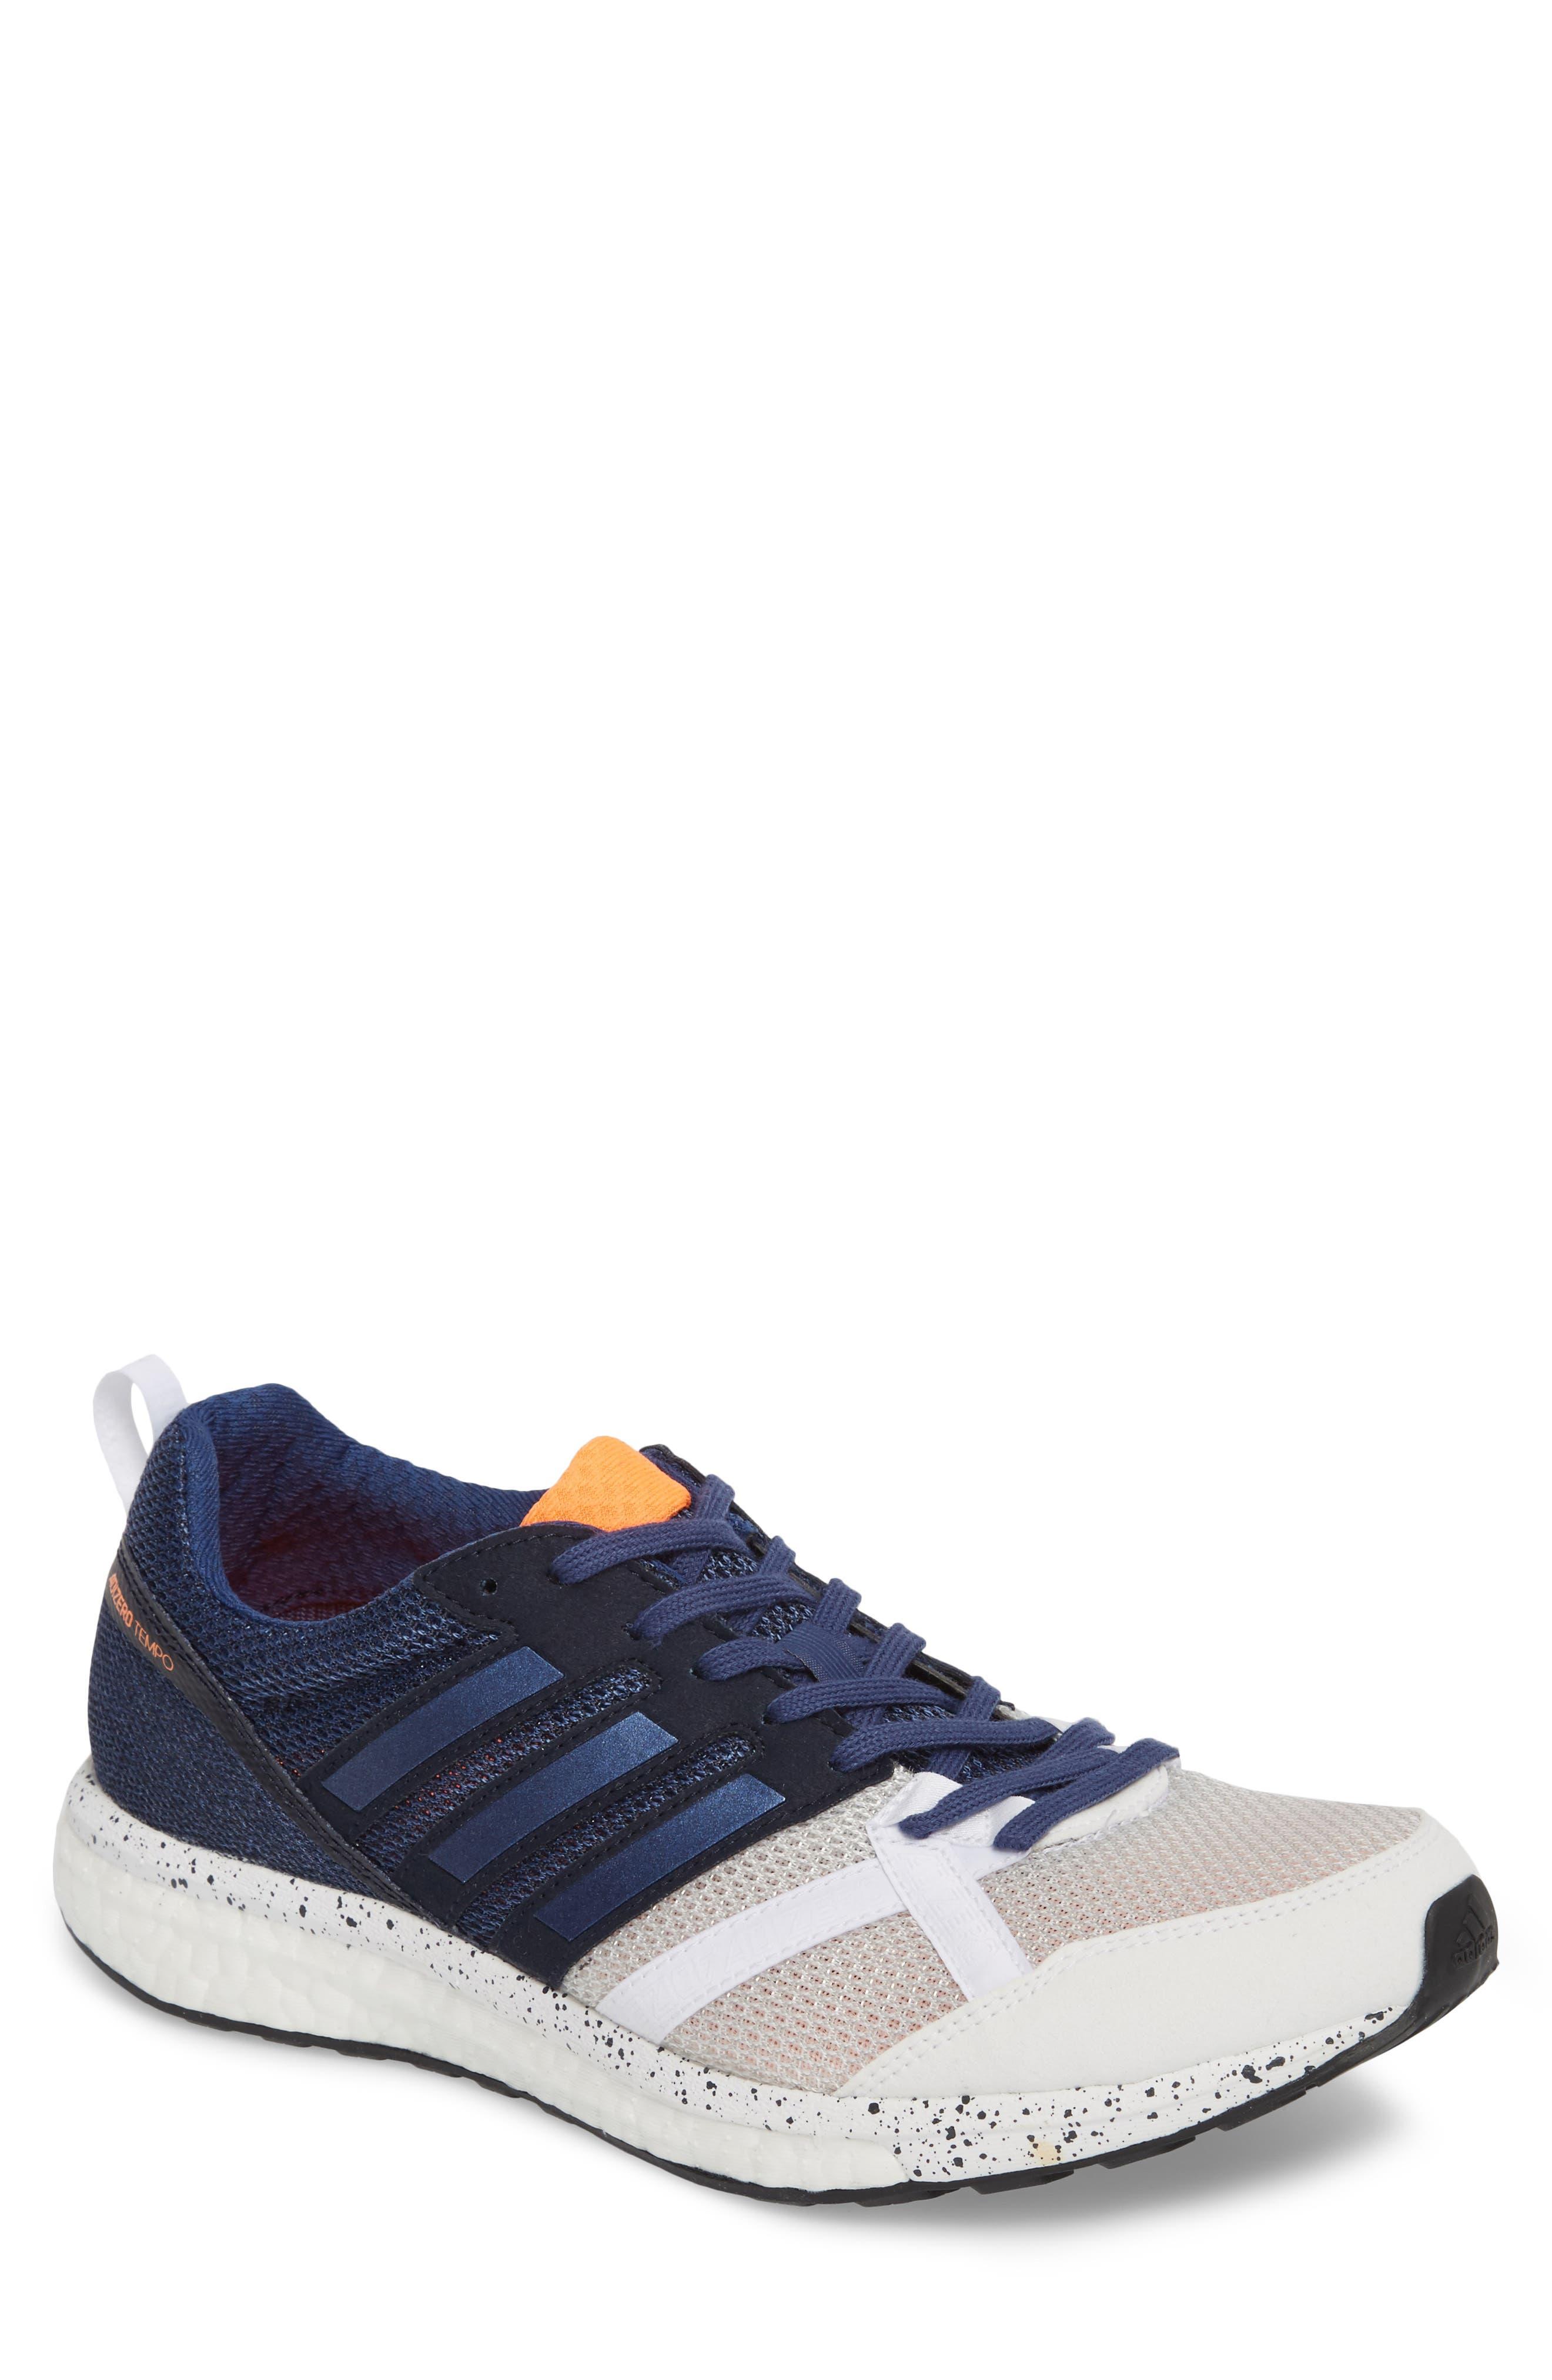 Adizero Tempo 9 M Running Shoe,                             Main thumbnail 1, color,                             White/ Indigo/ Core Black